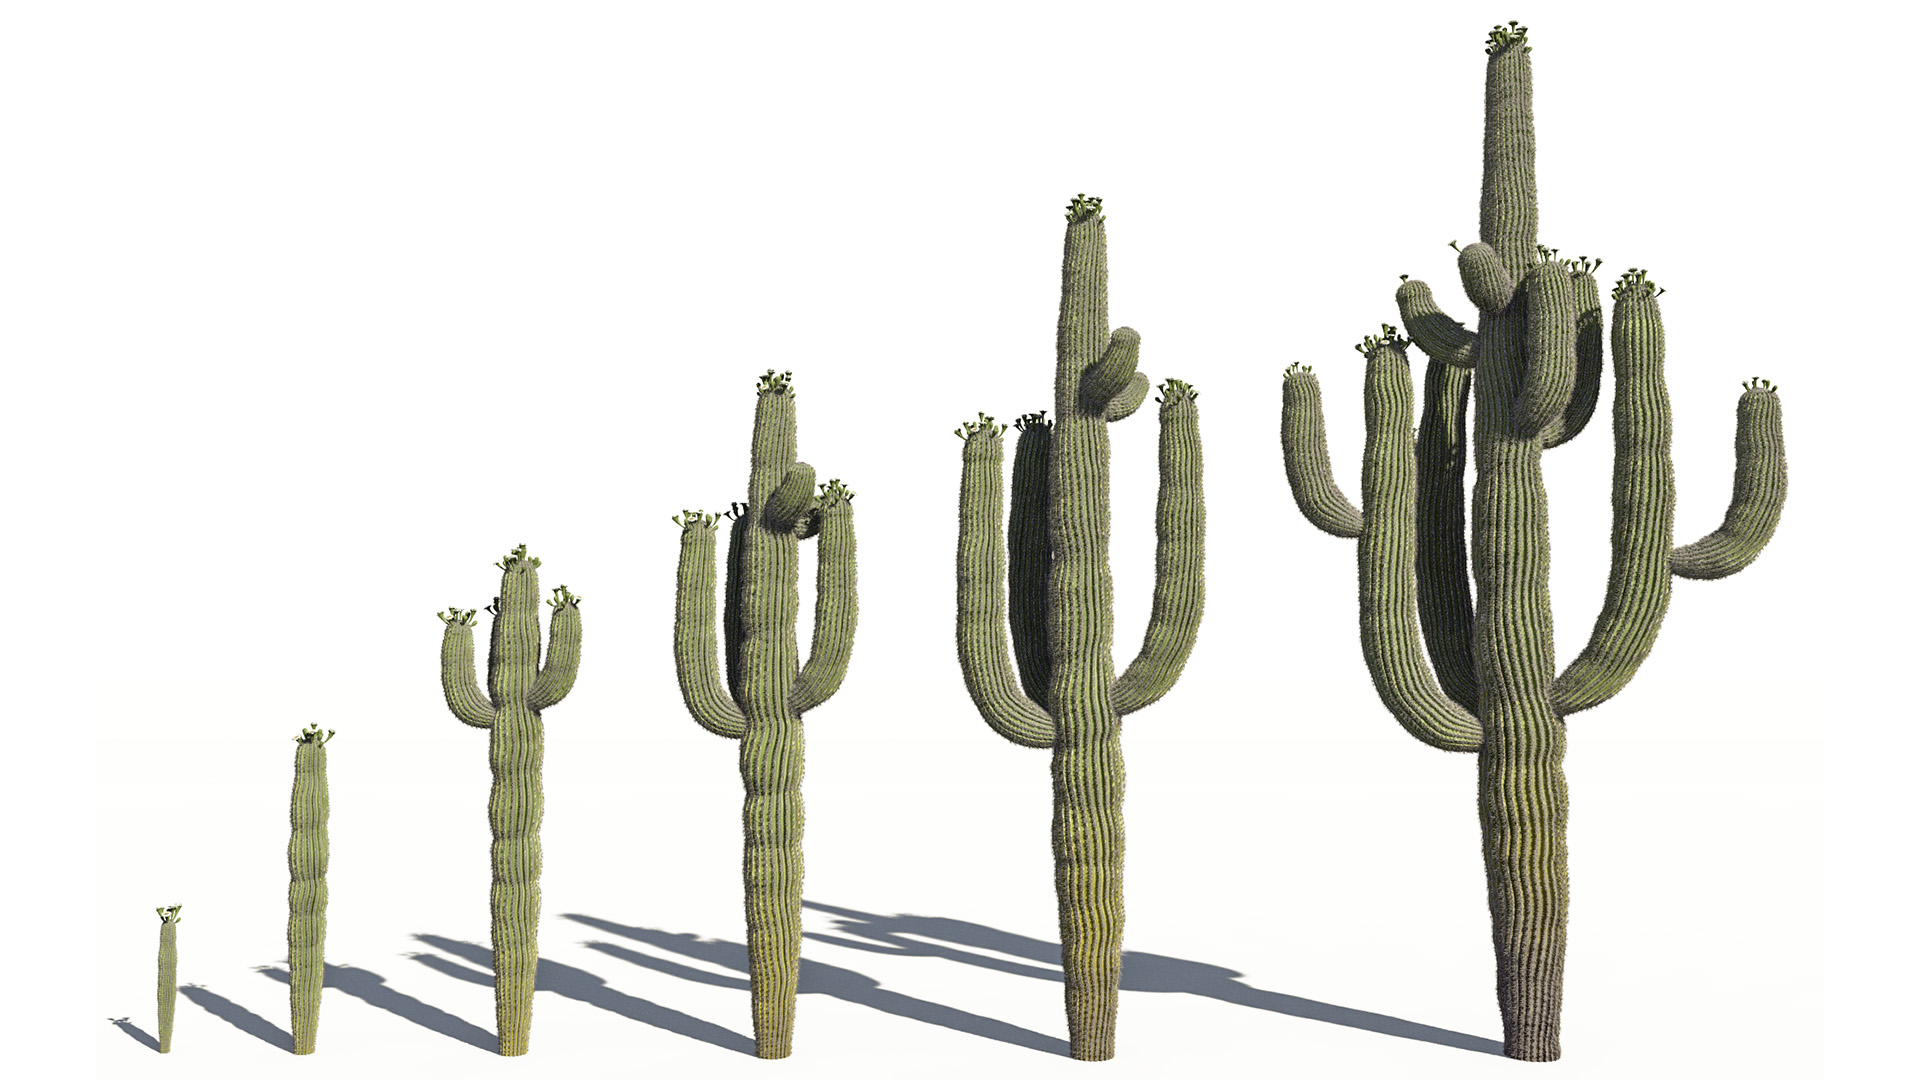 3D model of the Saguaro cactus Carnegiea gigantea maturity variations